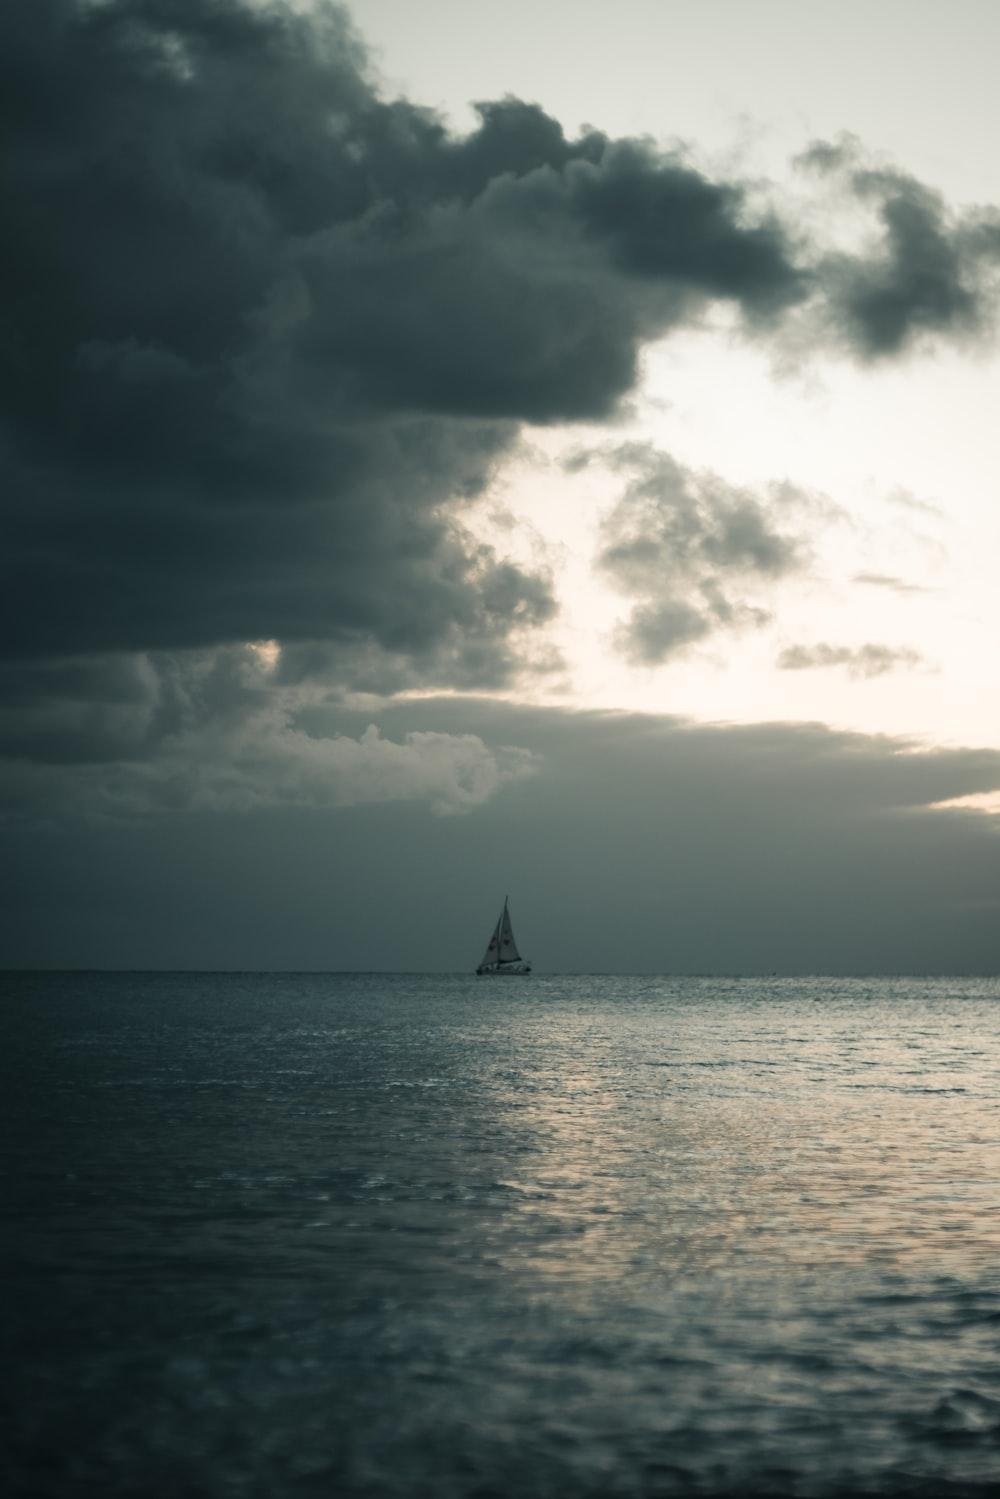 sailing boat under nimbus clouds